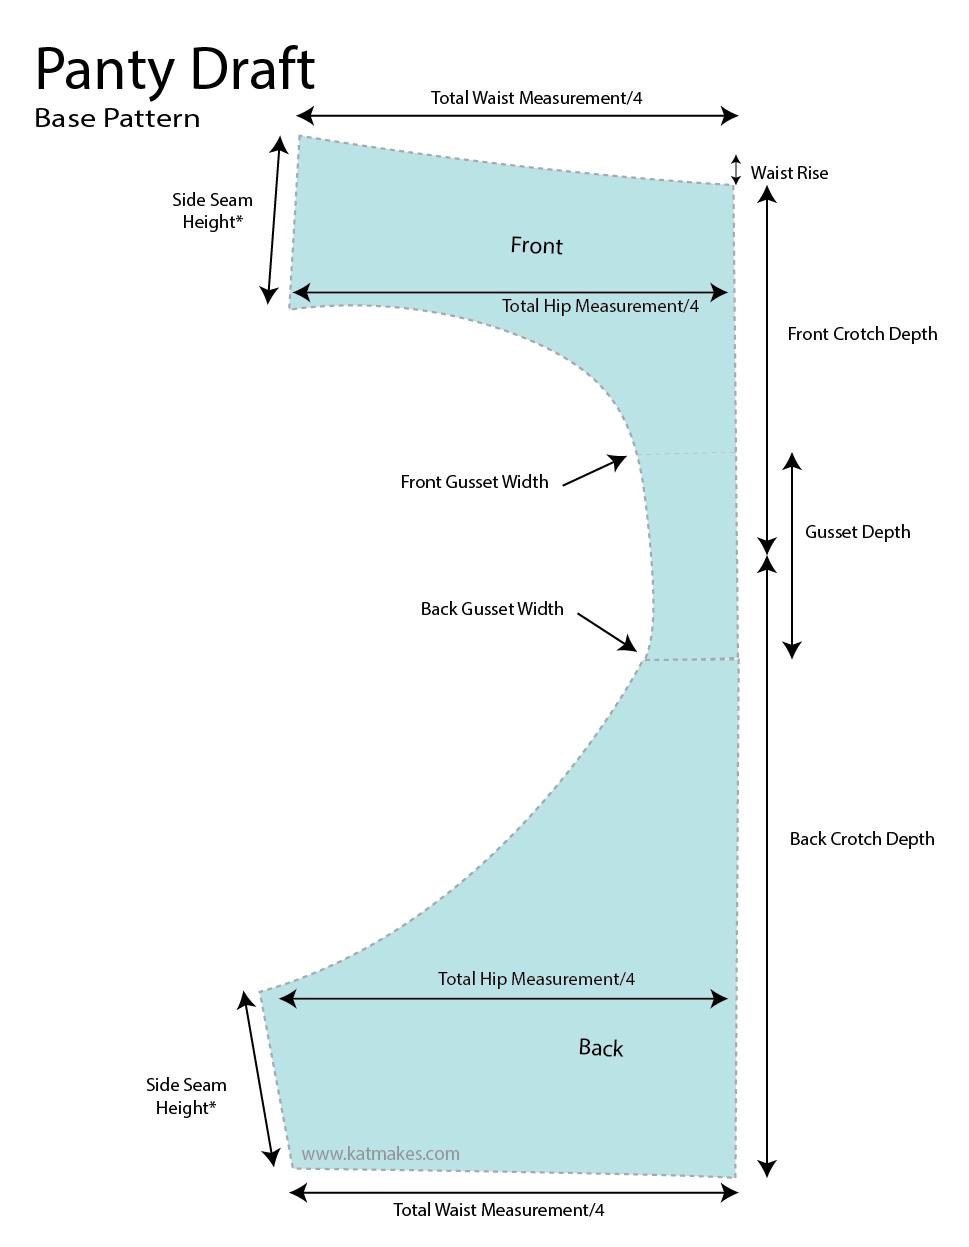 panty-draft-diagrams-04-04.jpg